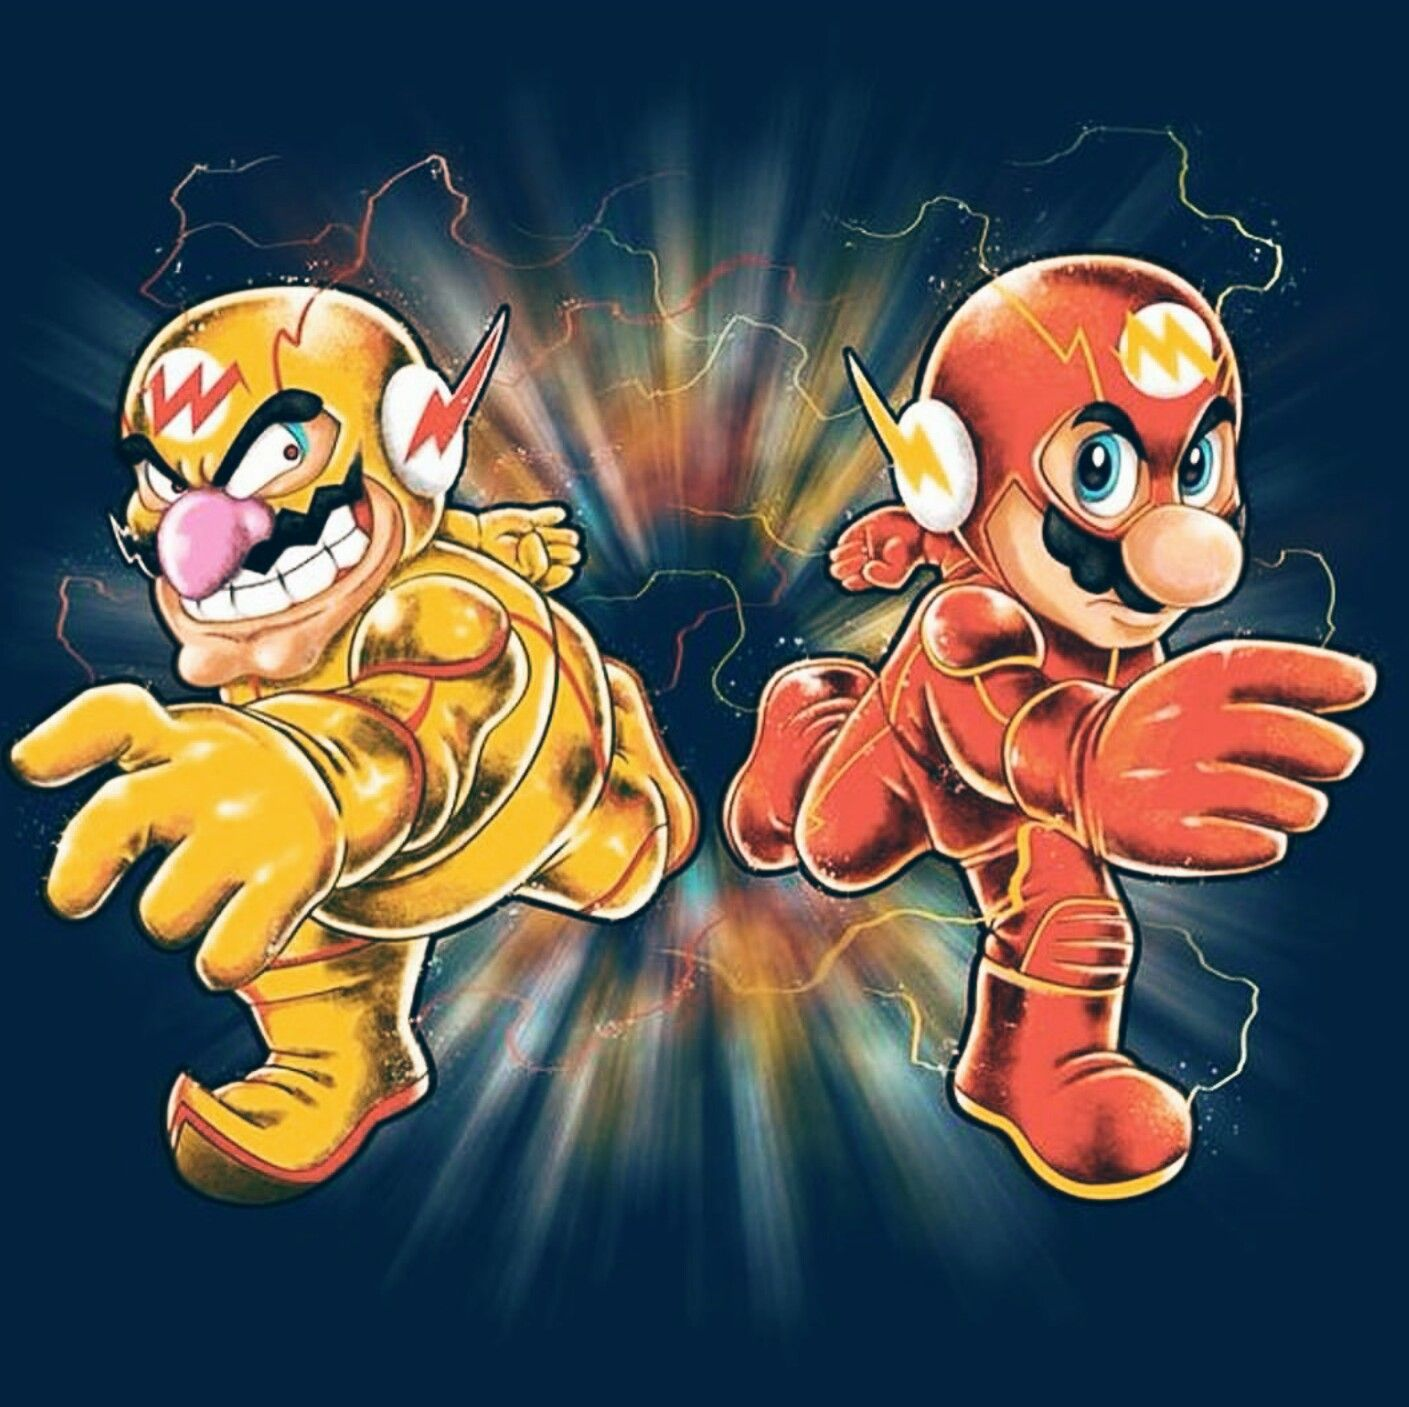 Flash vs. Reverse Flash in the style of Super Mario | Comics ...